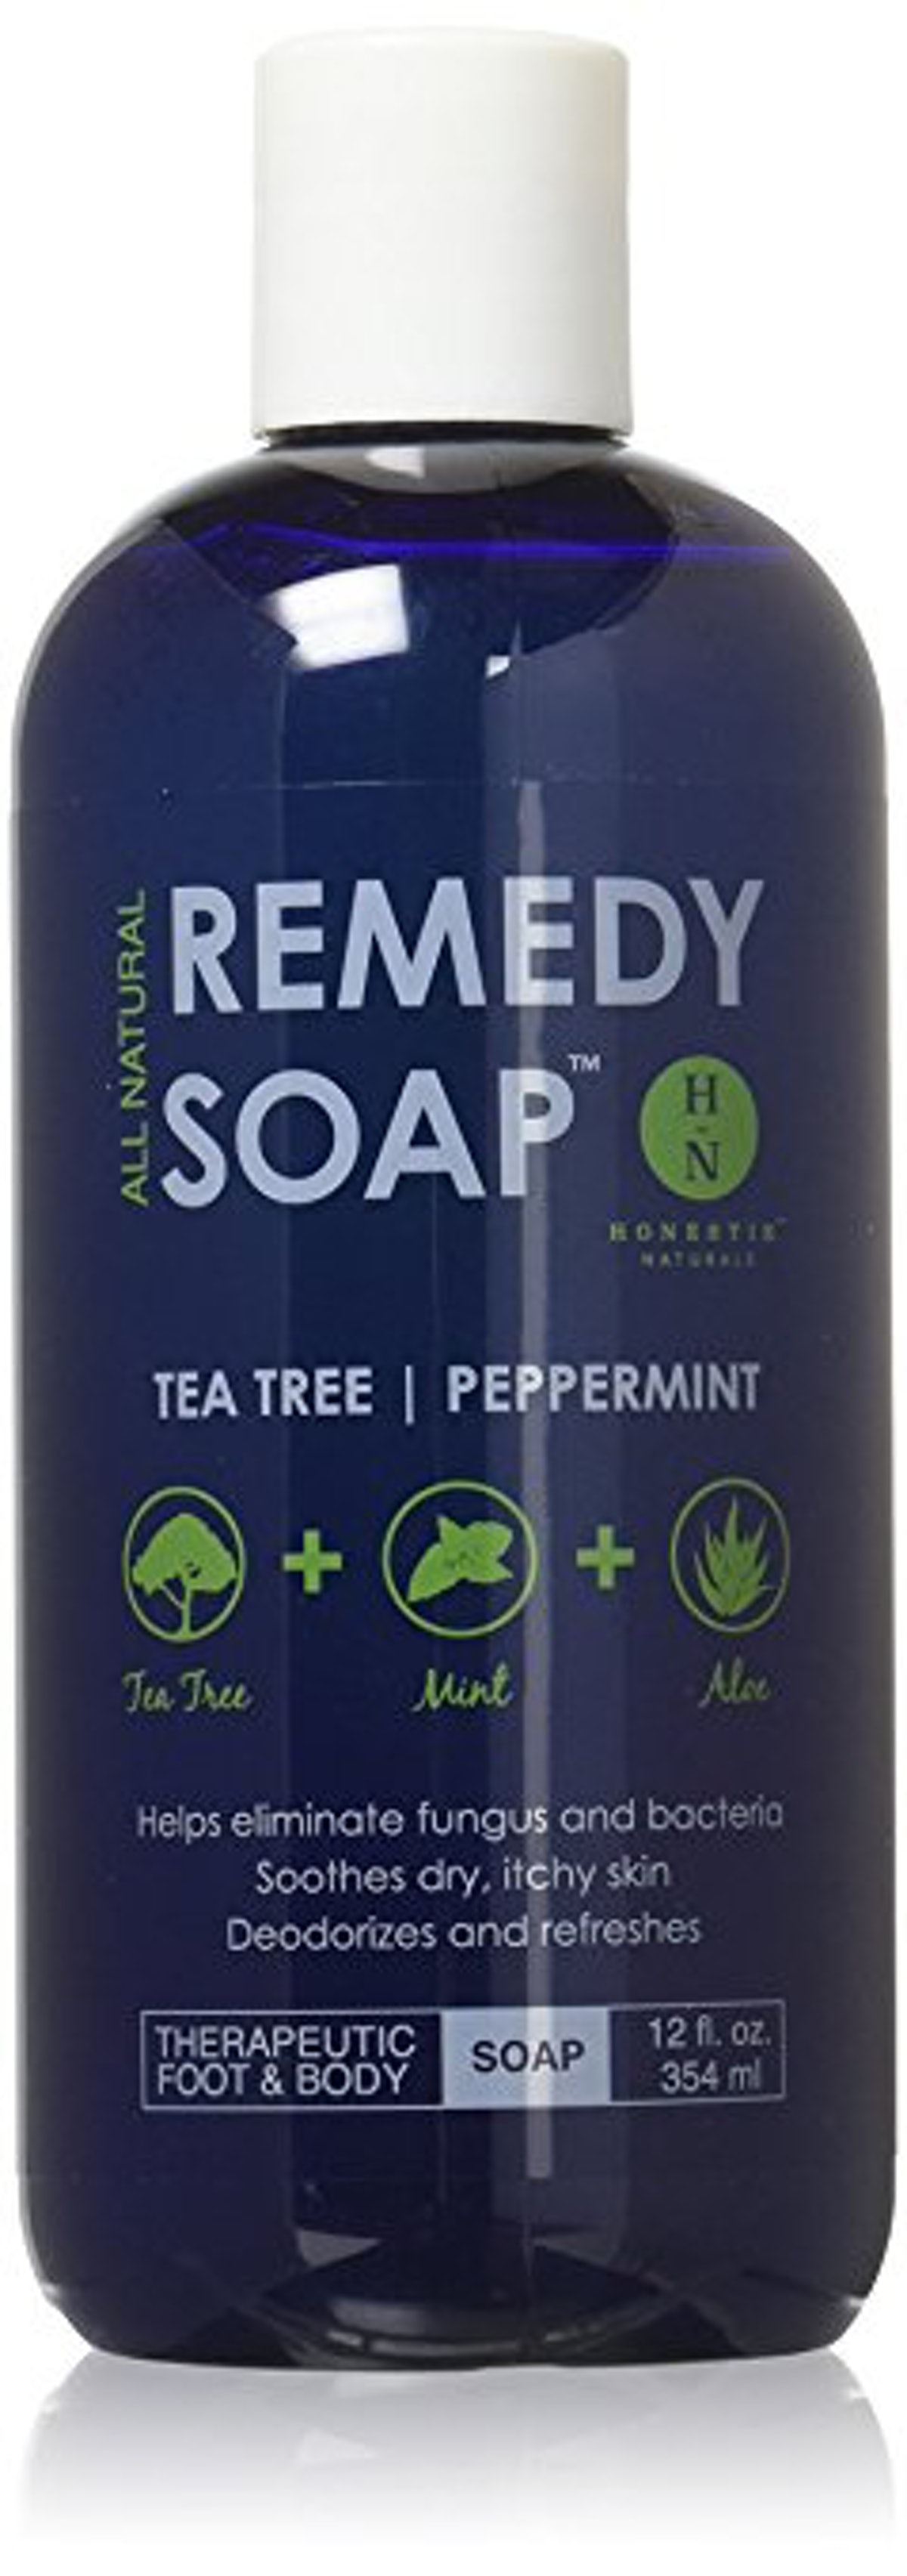 Remedy Wash Antifungal Soap